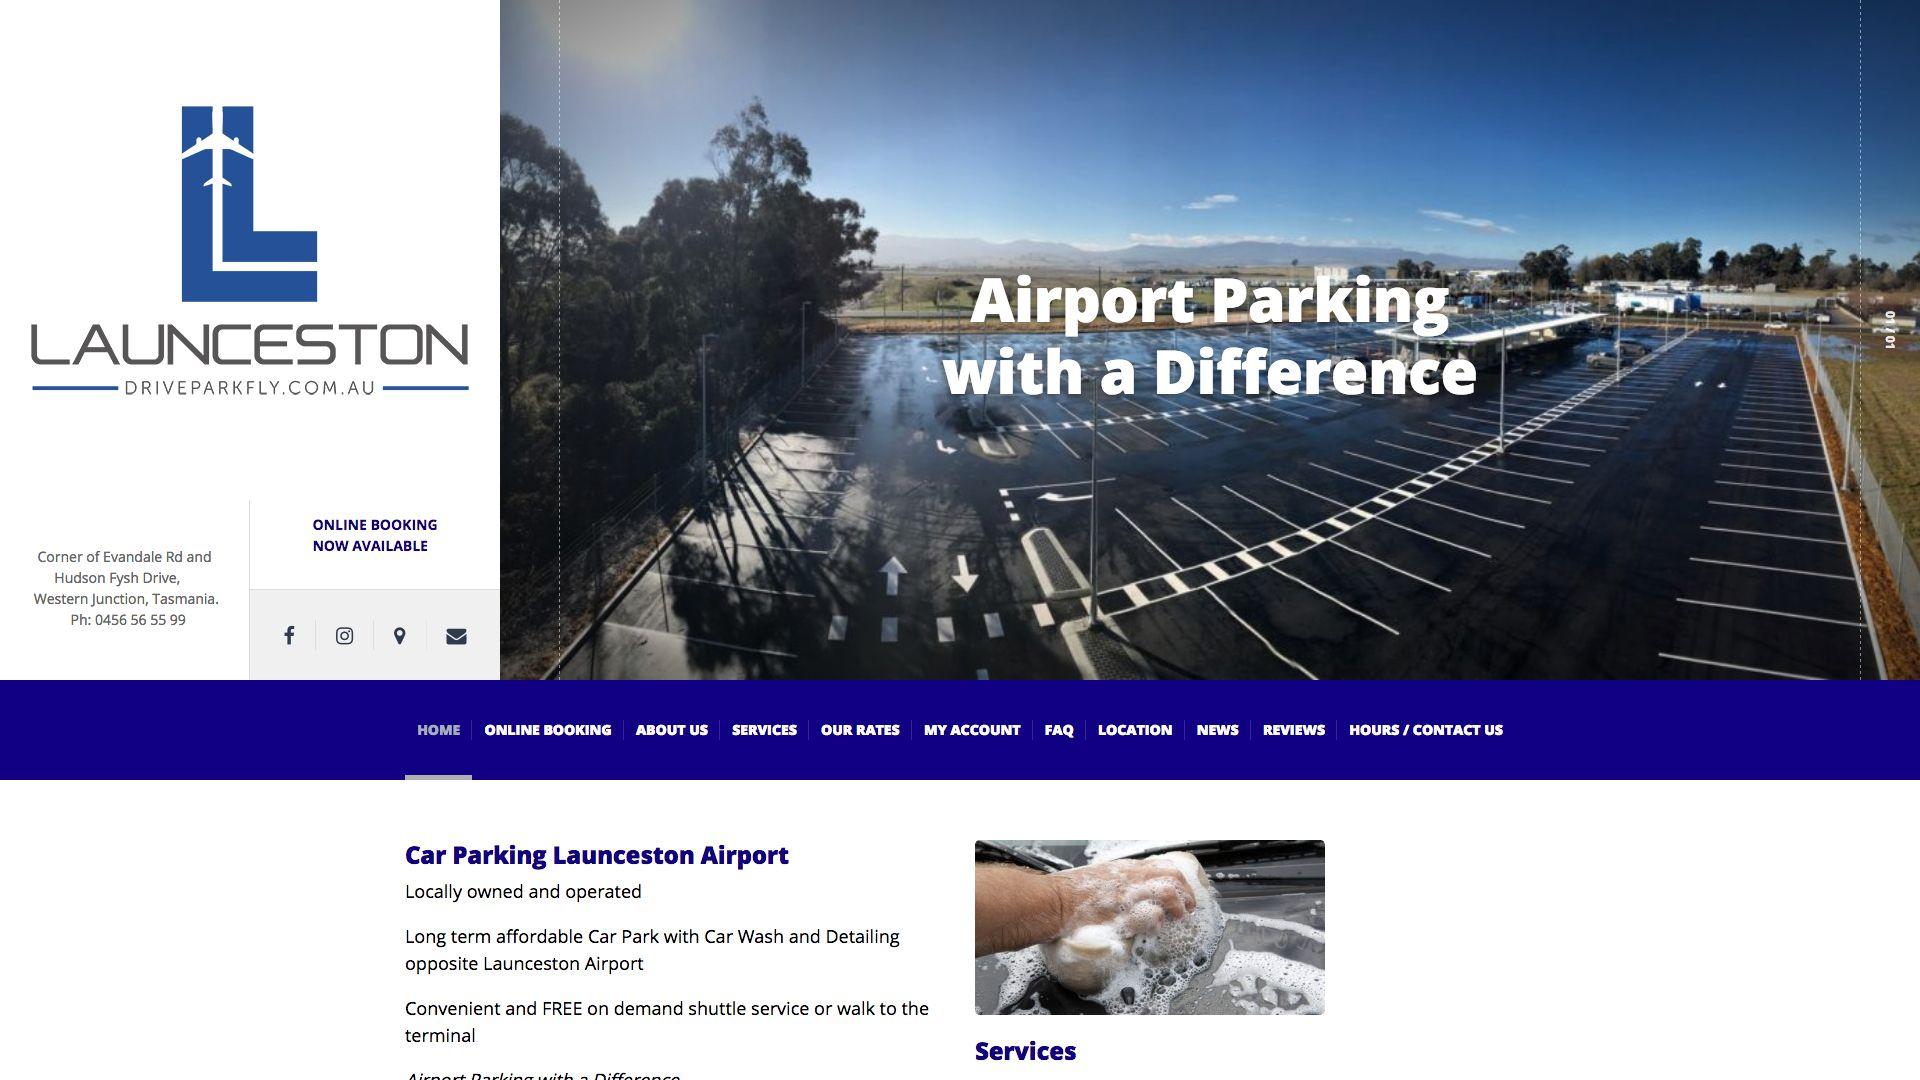 Launceston Drive Park Fly